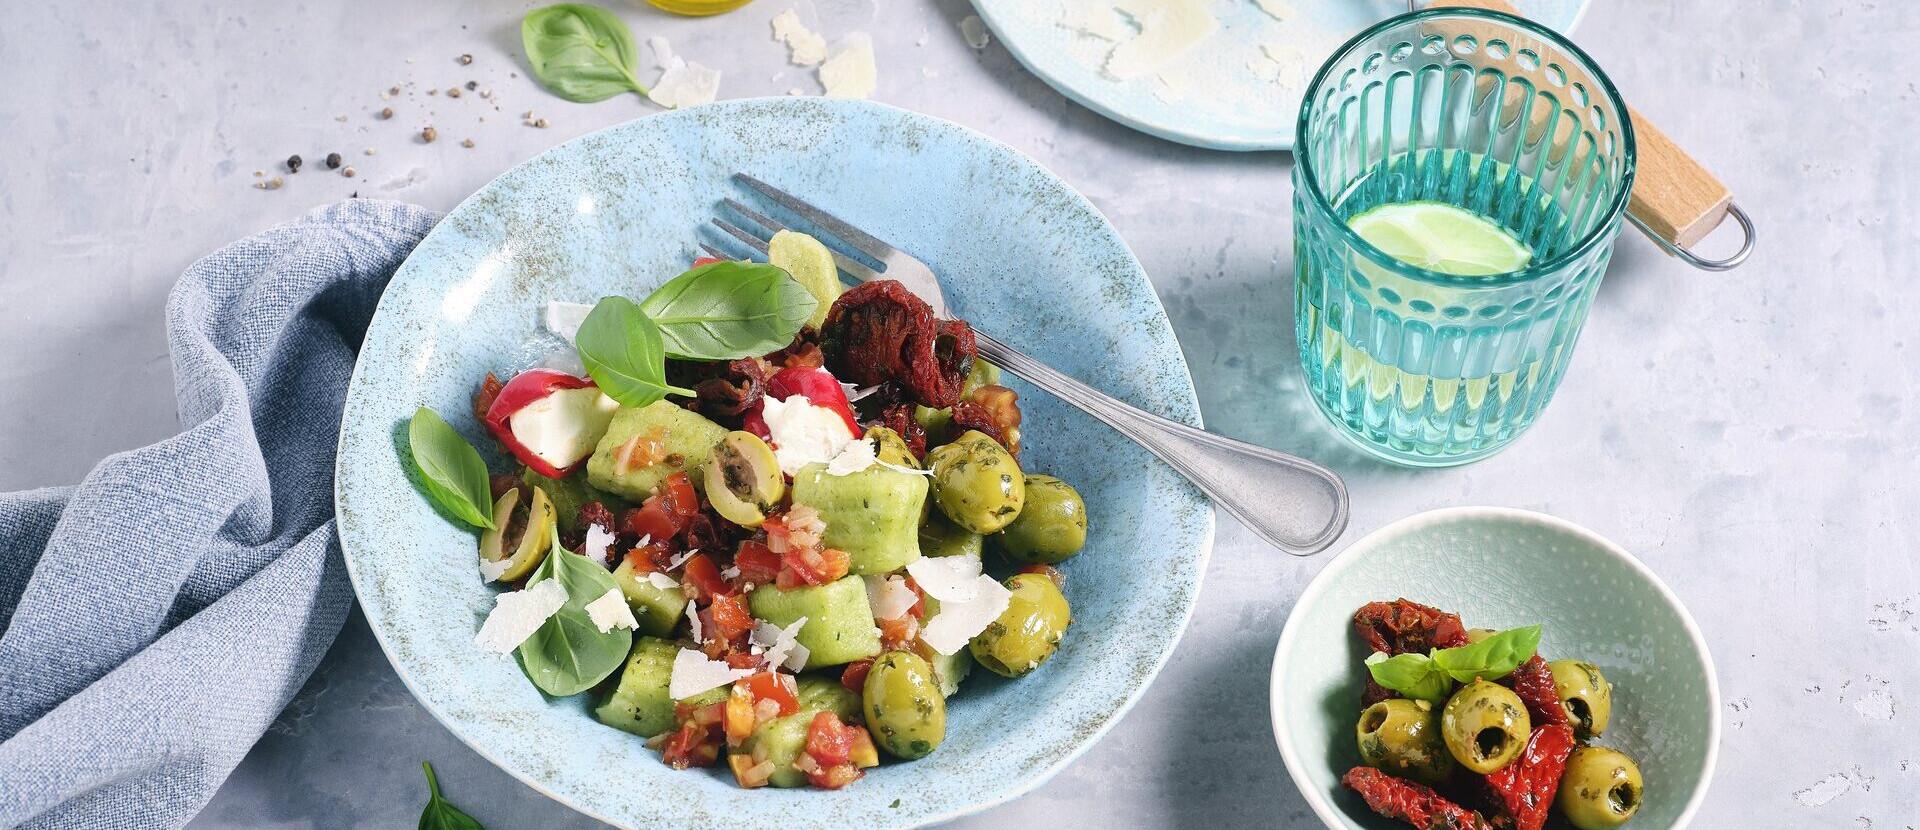 Gruene Gnocchi mit Tomatensauce Antipasti